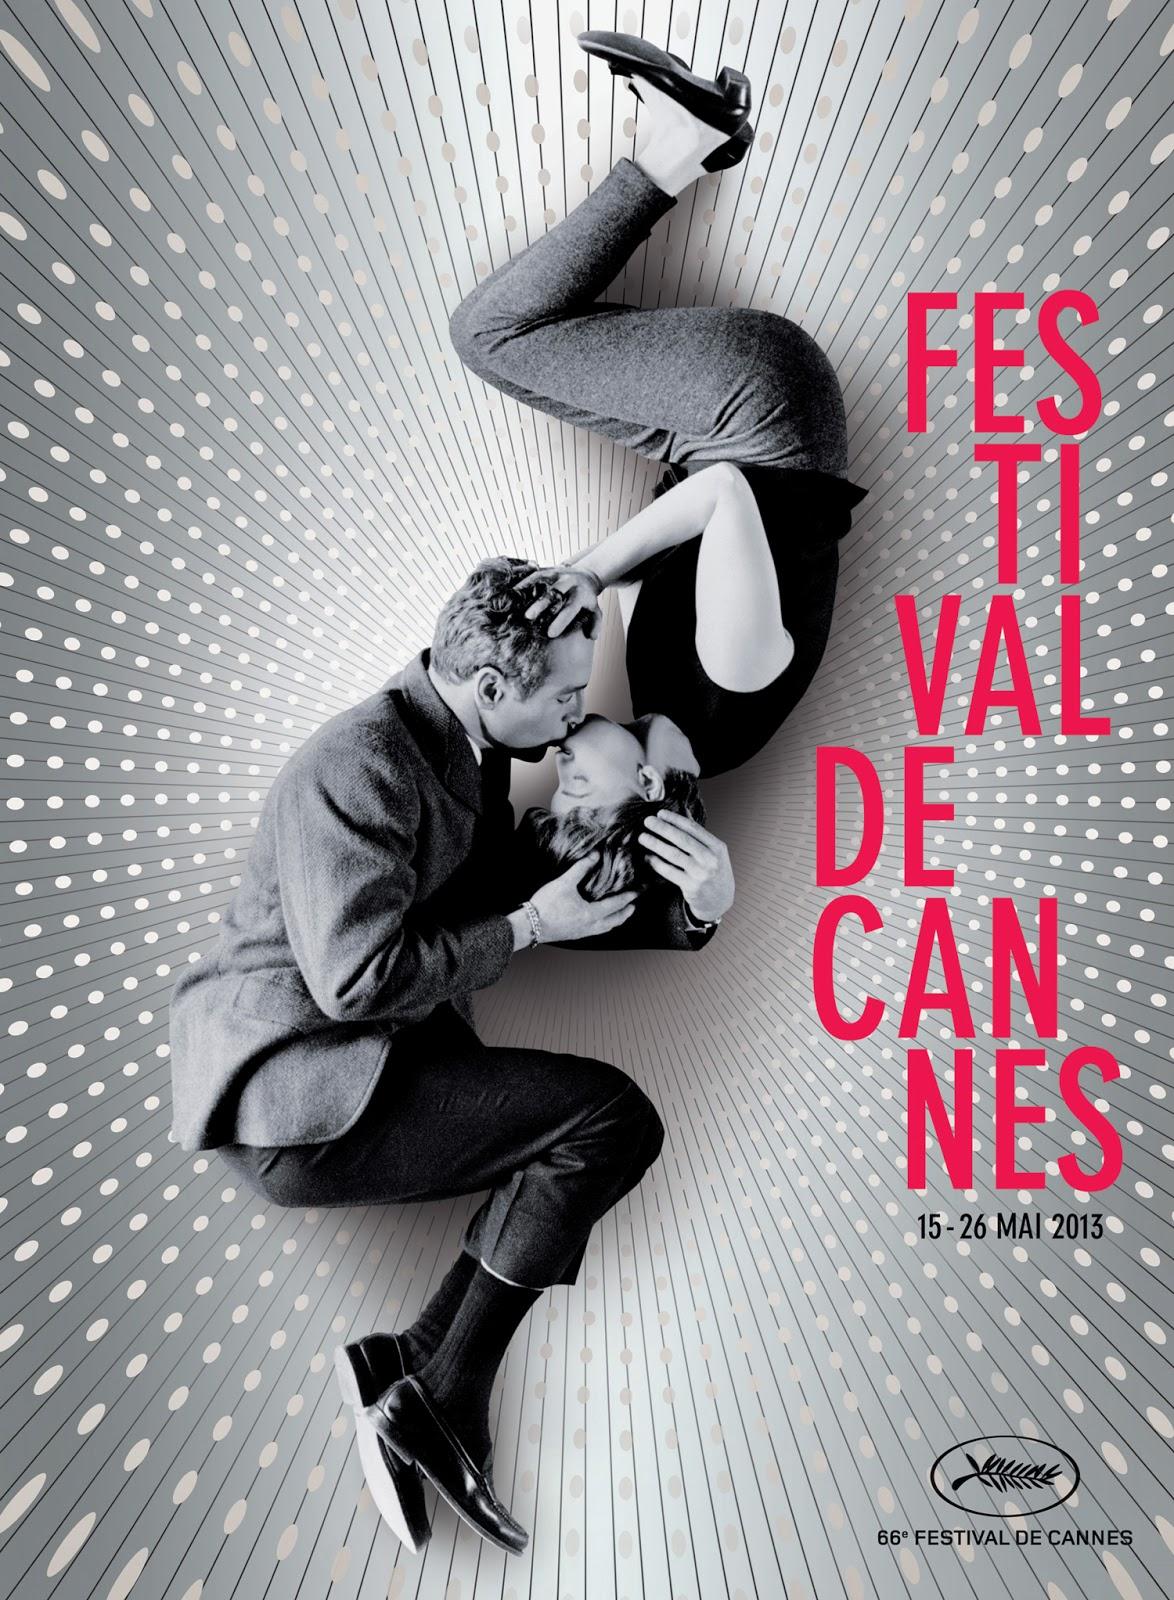 http://2.bp.blogspot.com/-EpnuxyzKMdE/UXAYovRQyoI/AAAAAAAAZ7Y/j-Y0Akls73E/s1600/Cannes+2013.jpg